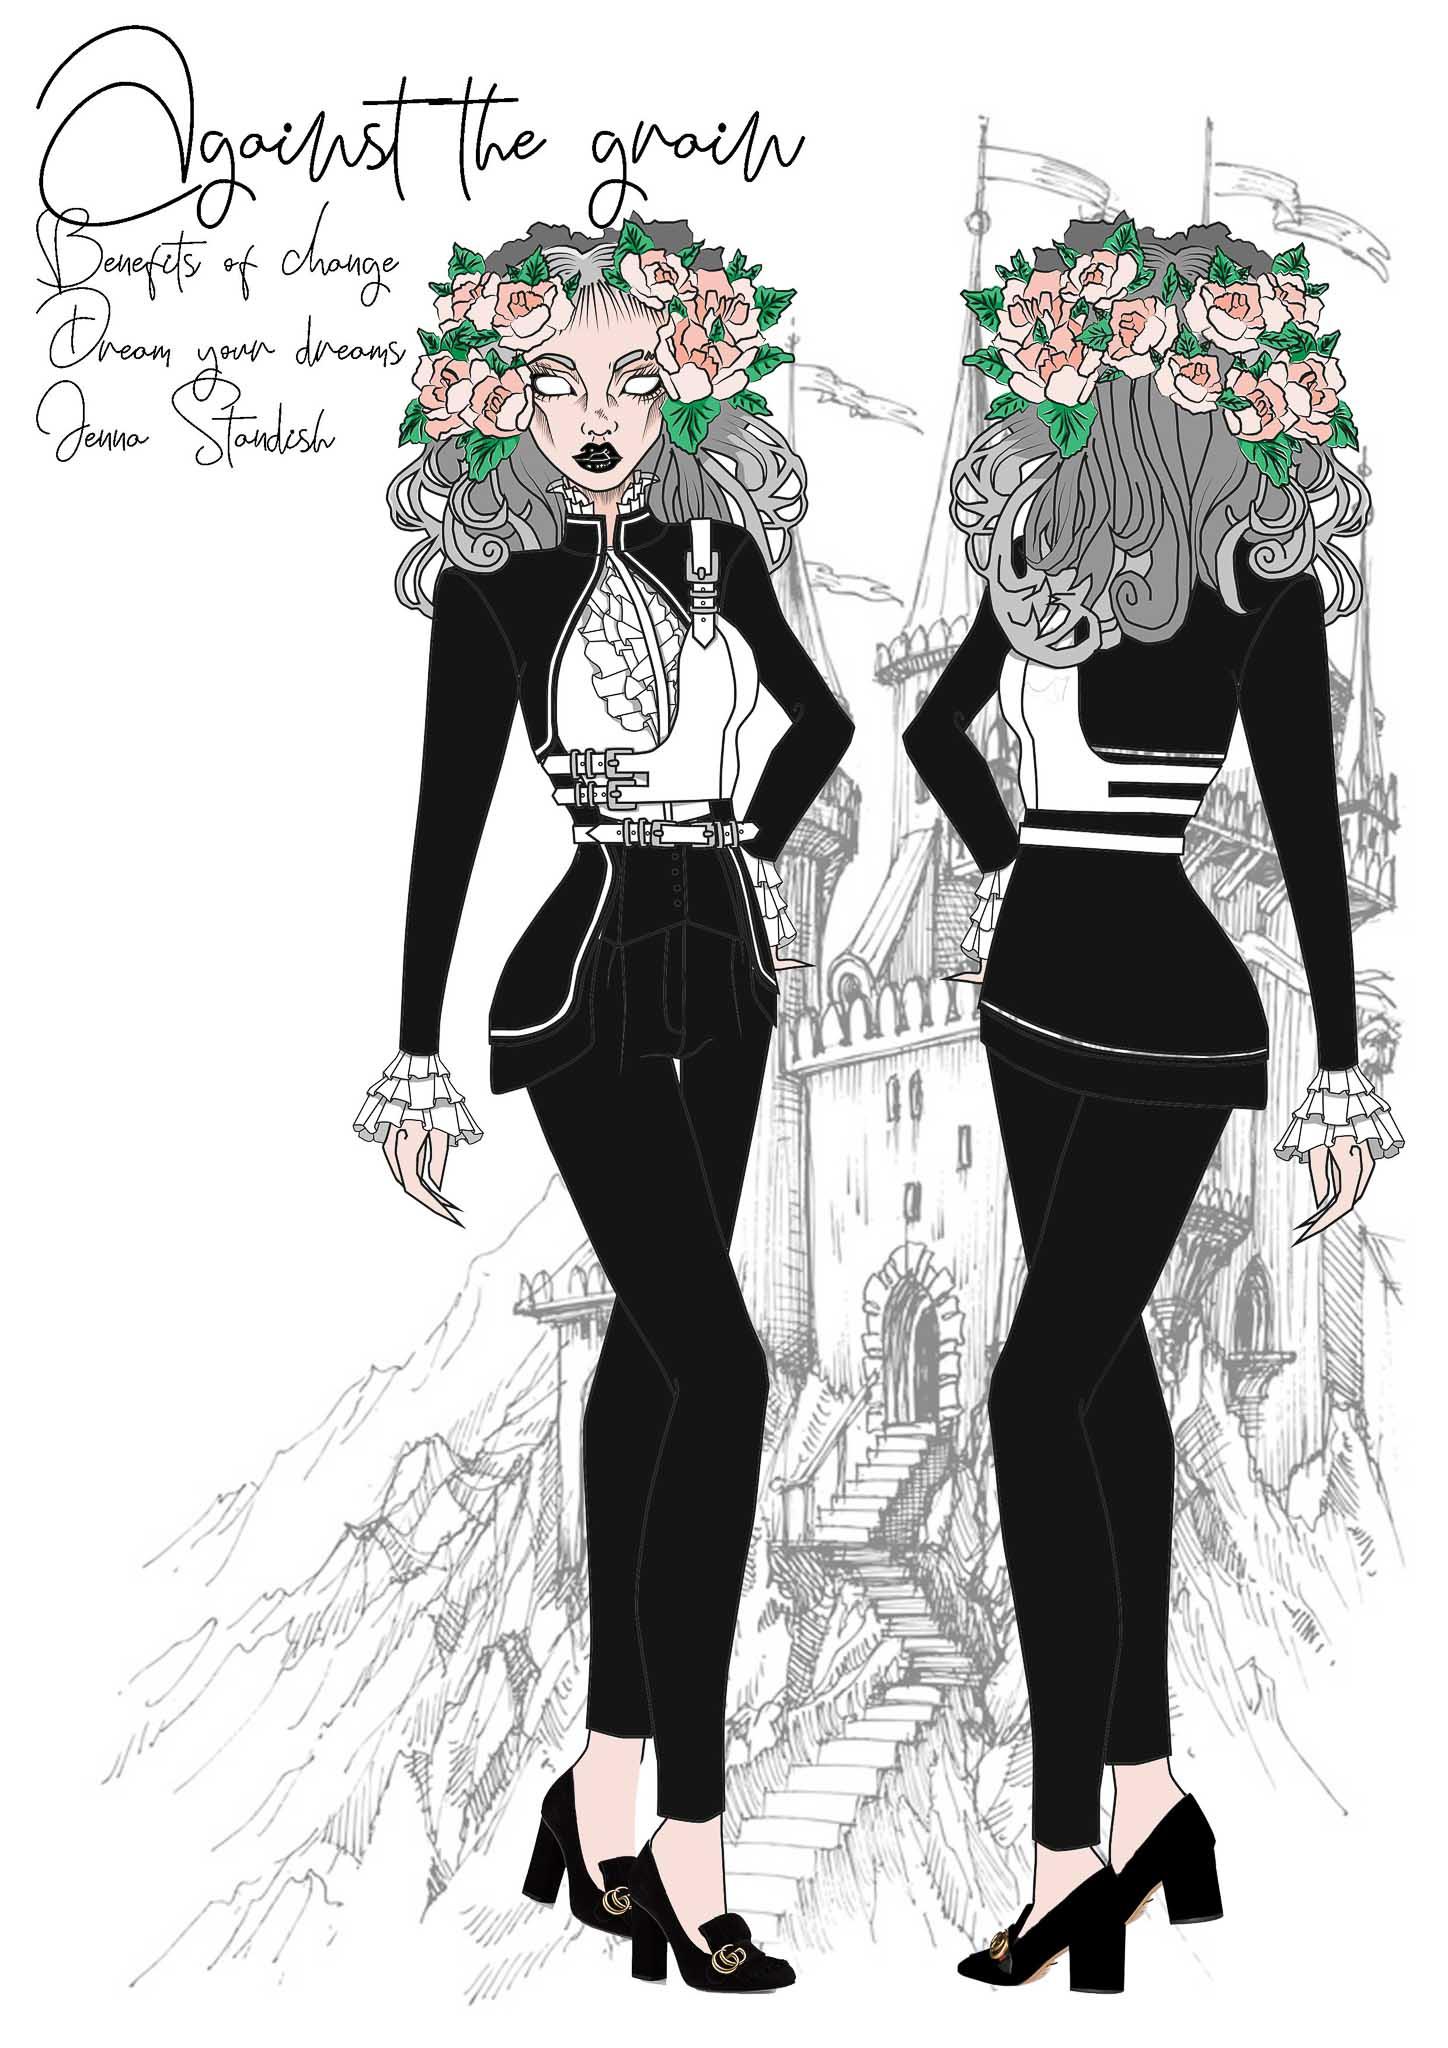 Against the Grain: Jenna Standish, Südafrika, Student, Elizabeth Galloway Academy of Fashion Design (Dream your Dreams)